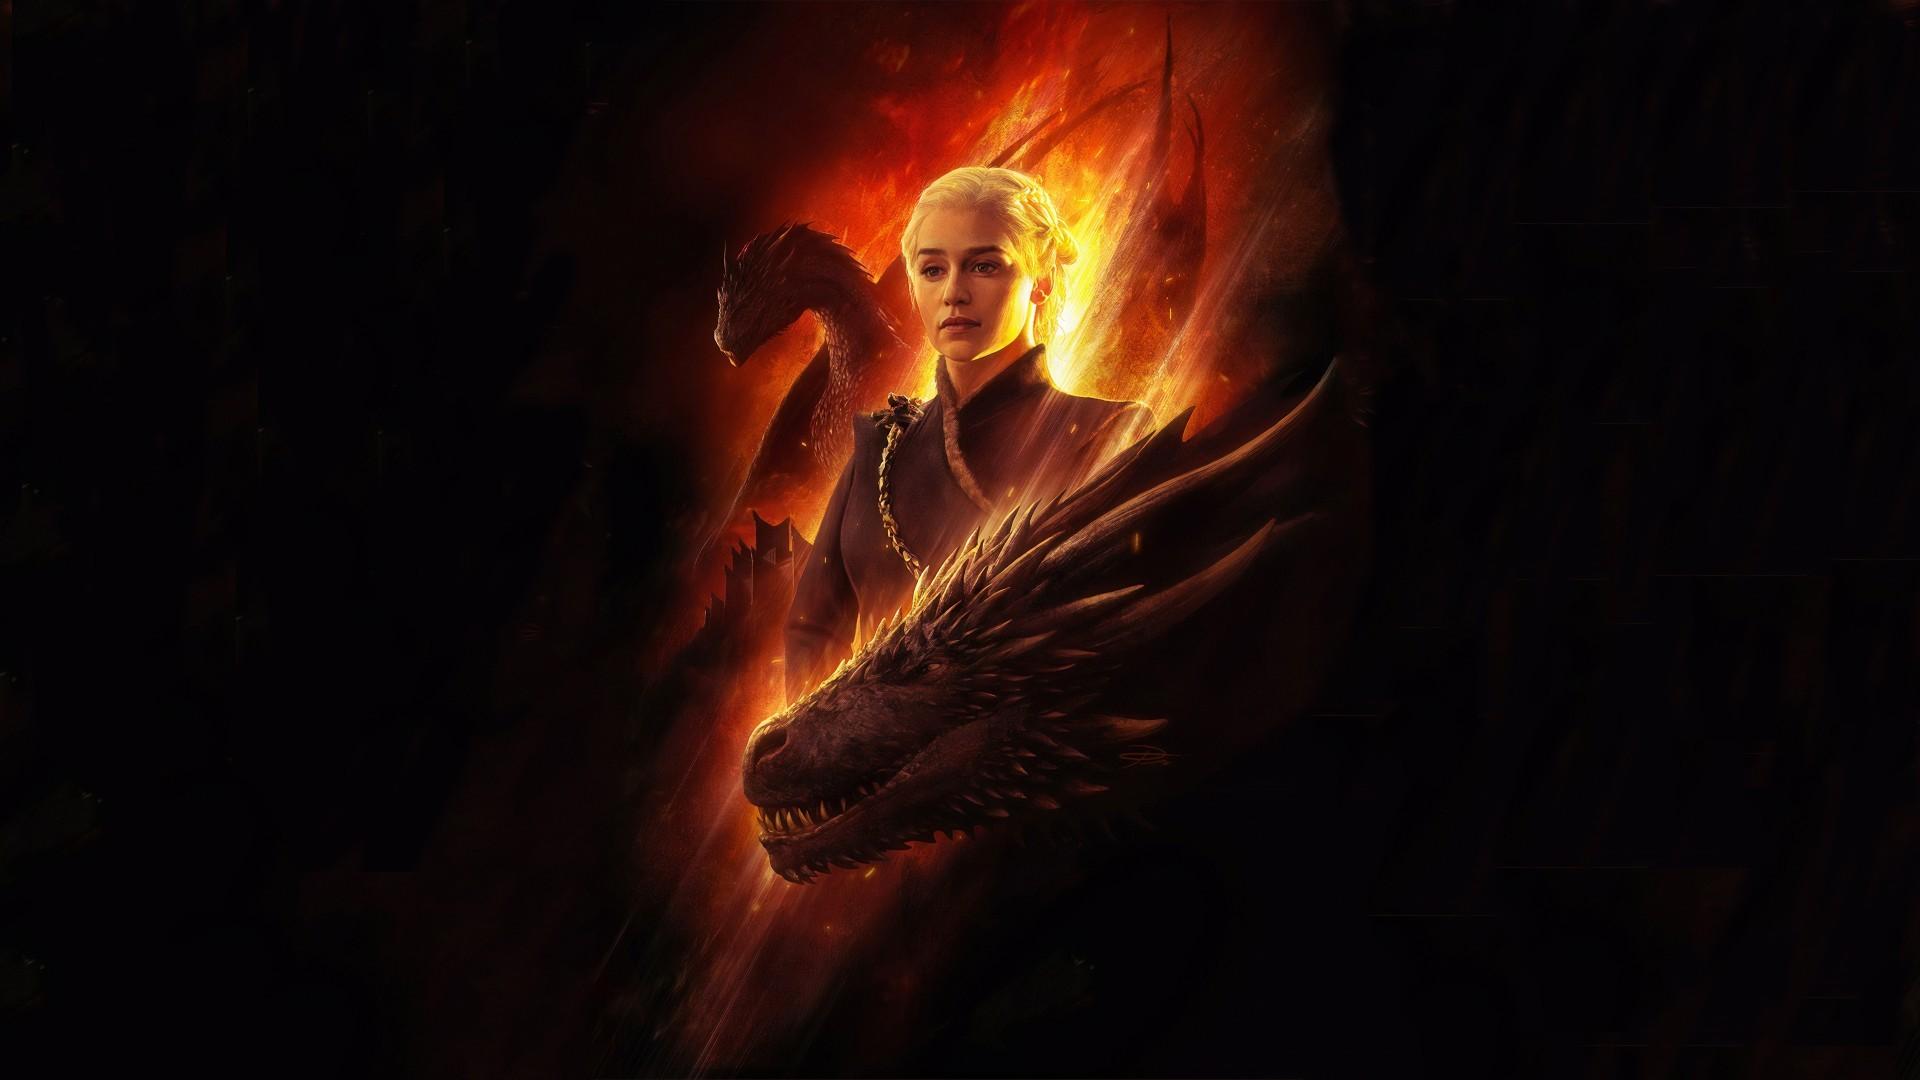 House Targaryen, Game Of Thrones, Flames, Dragon, Artwork, - Daenerys Targaryen Game Of Thrones Wallpaper 4k - HD Wallpaper